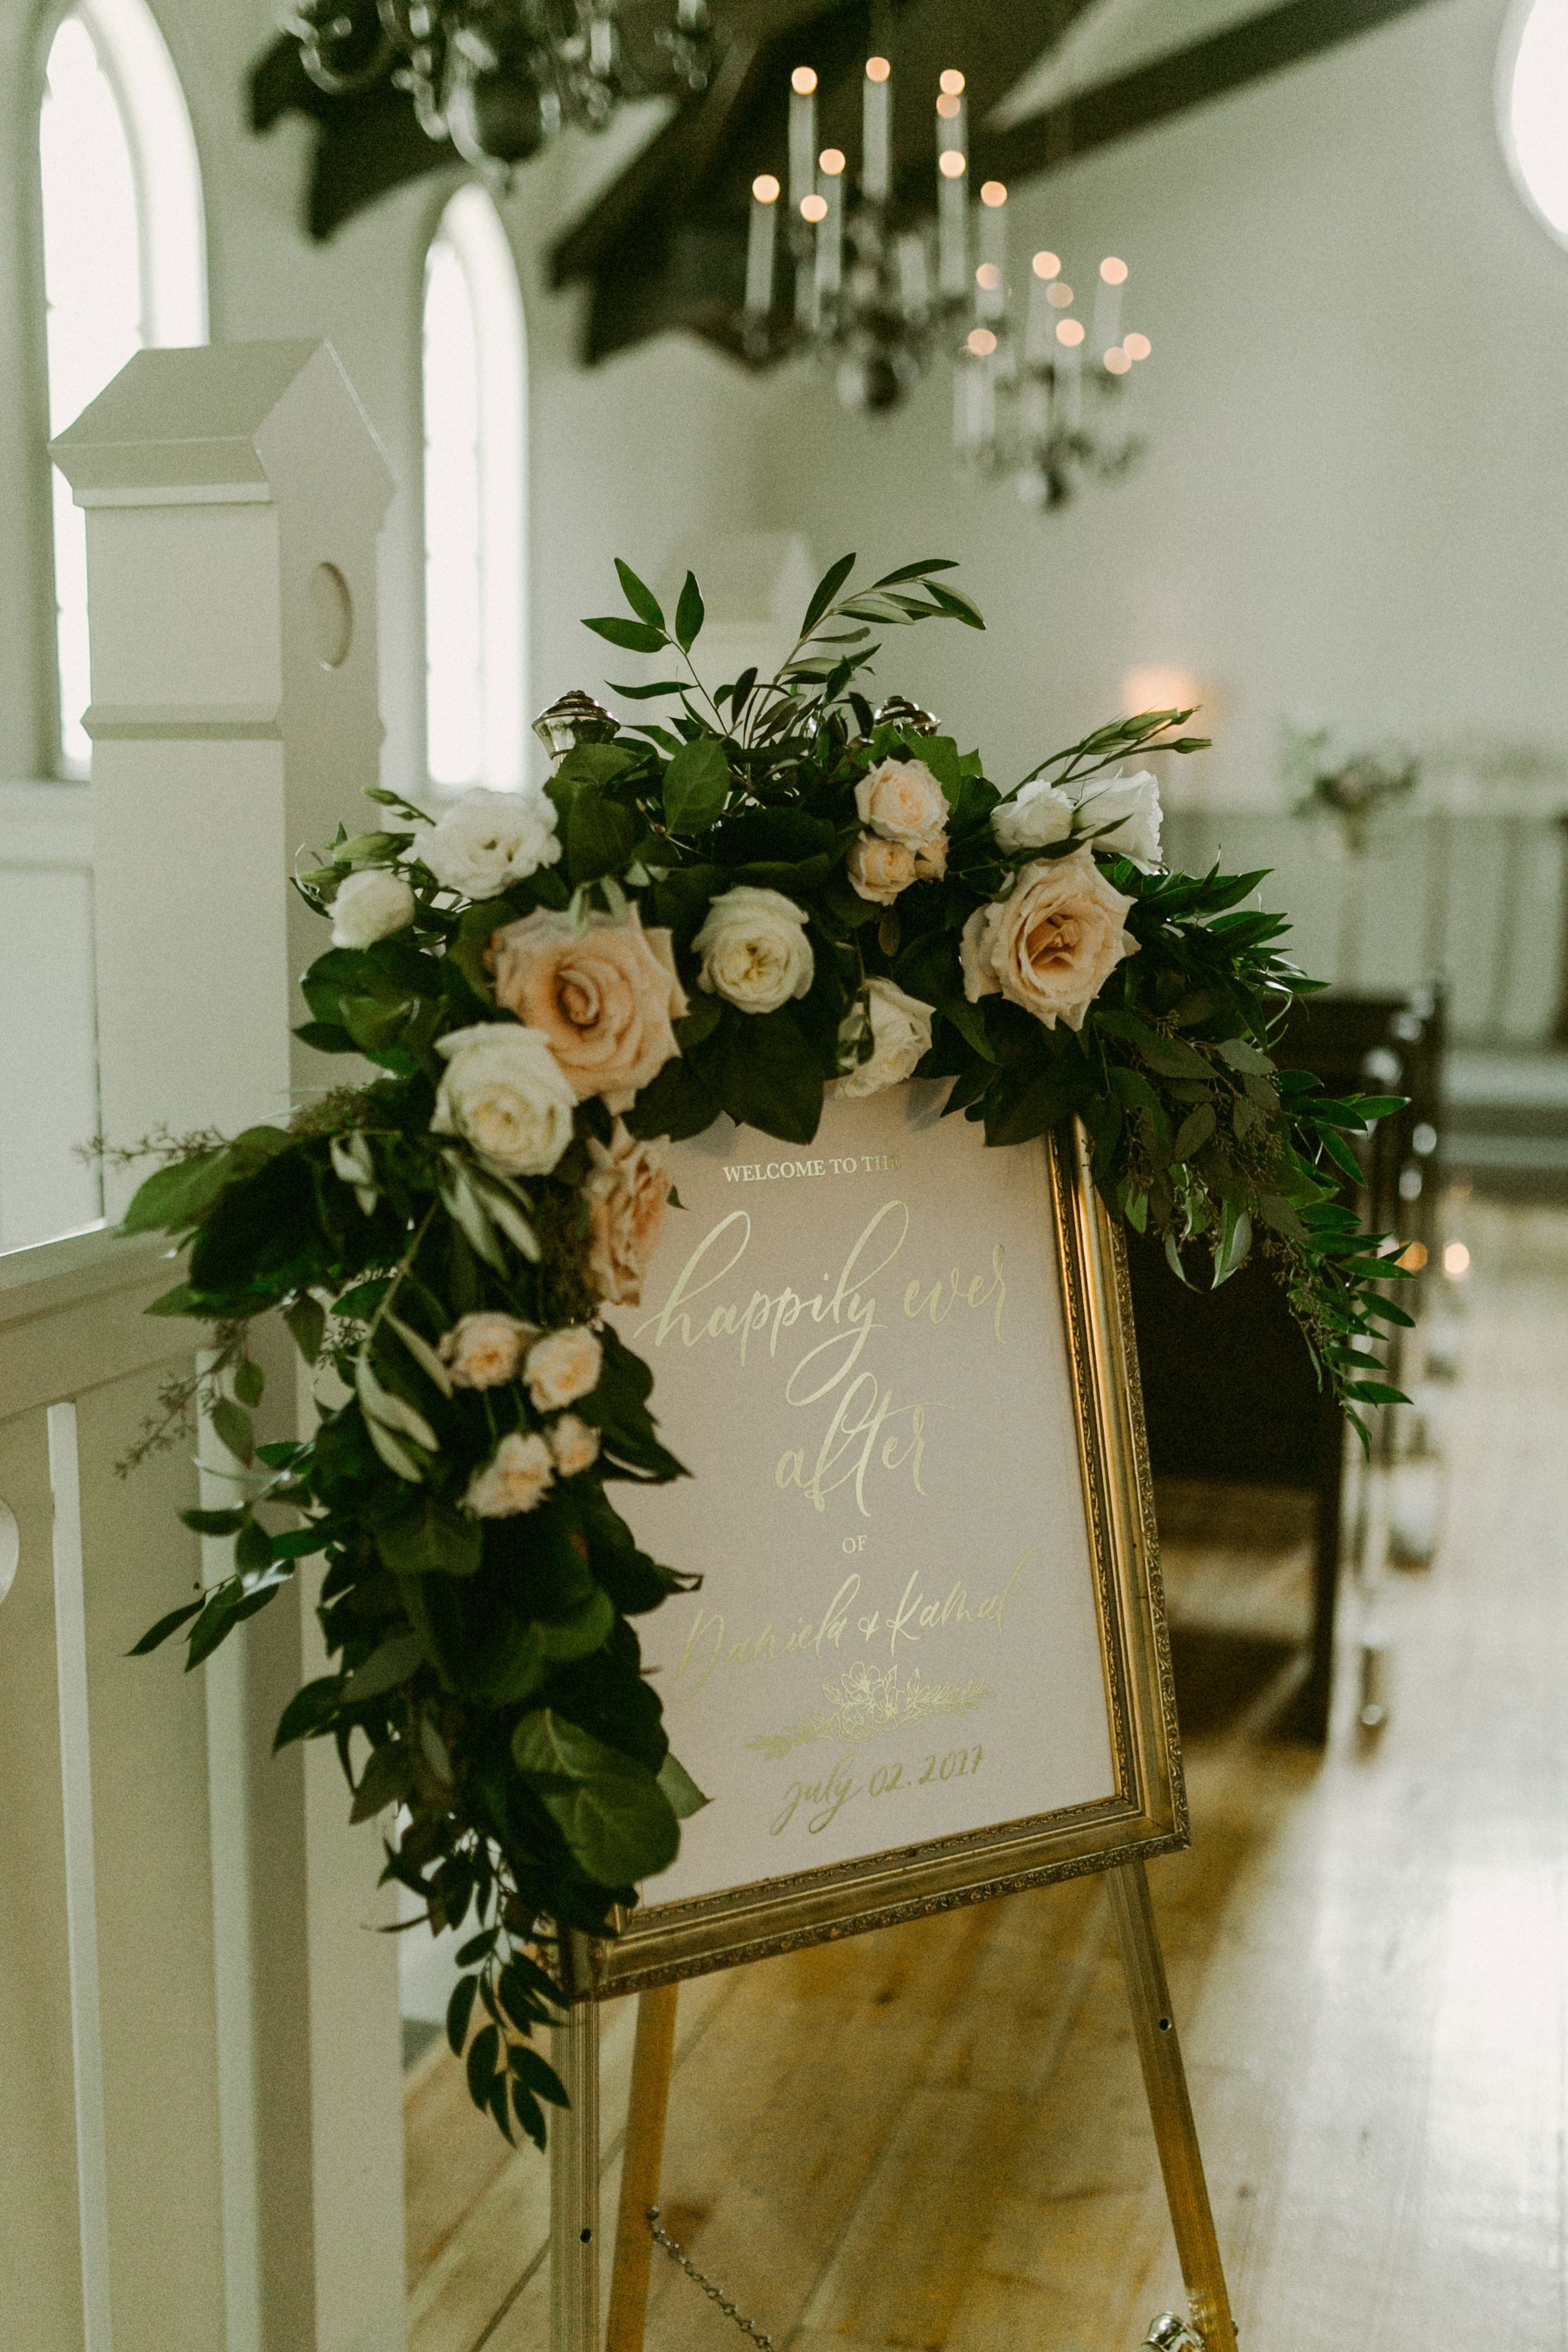 DanielaKamal_WEDDING_DOCTORSHOUSE_bisouseventsYAS-183ASE.jpg